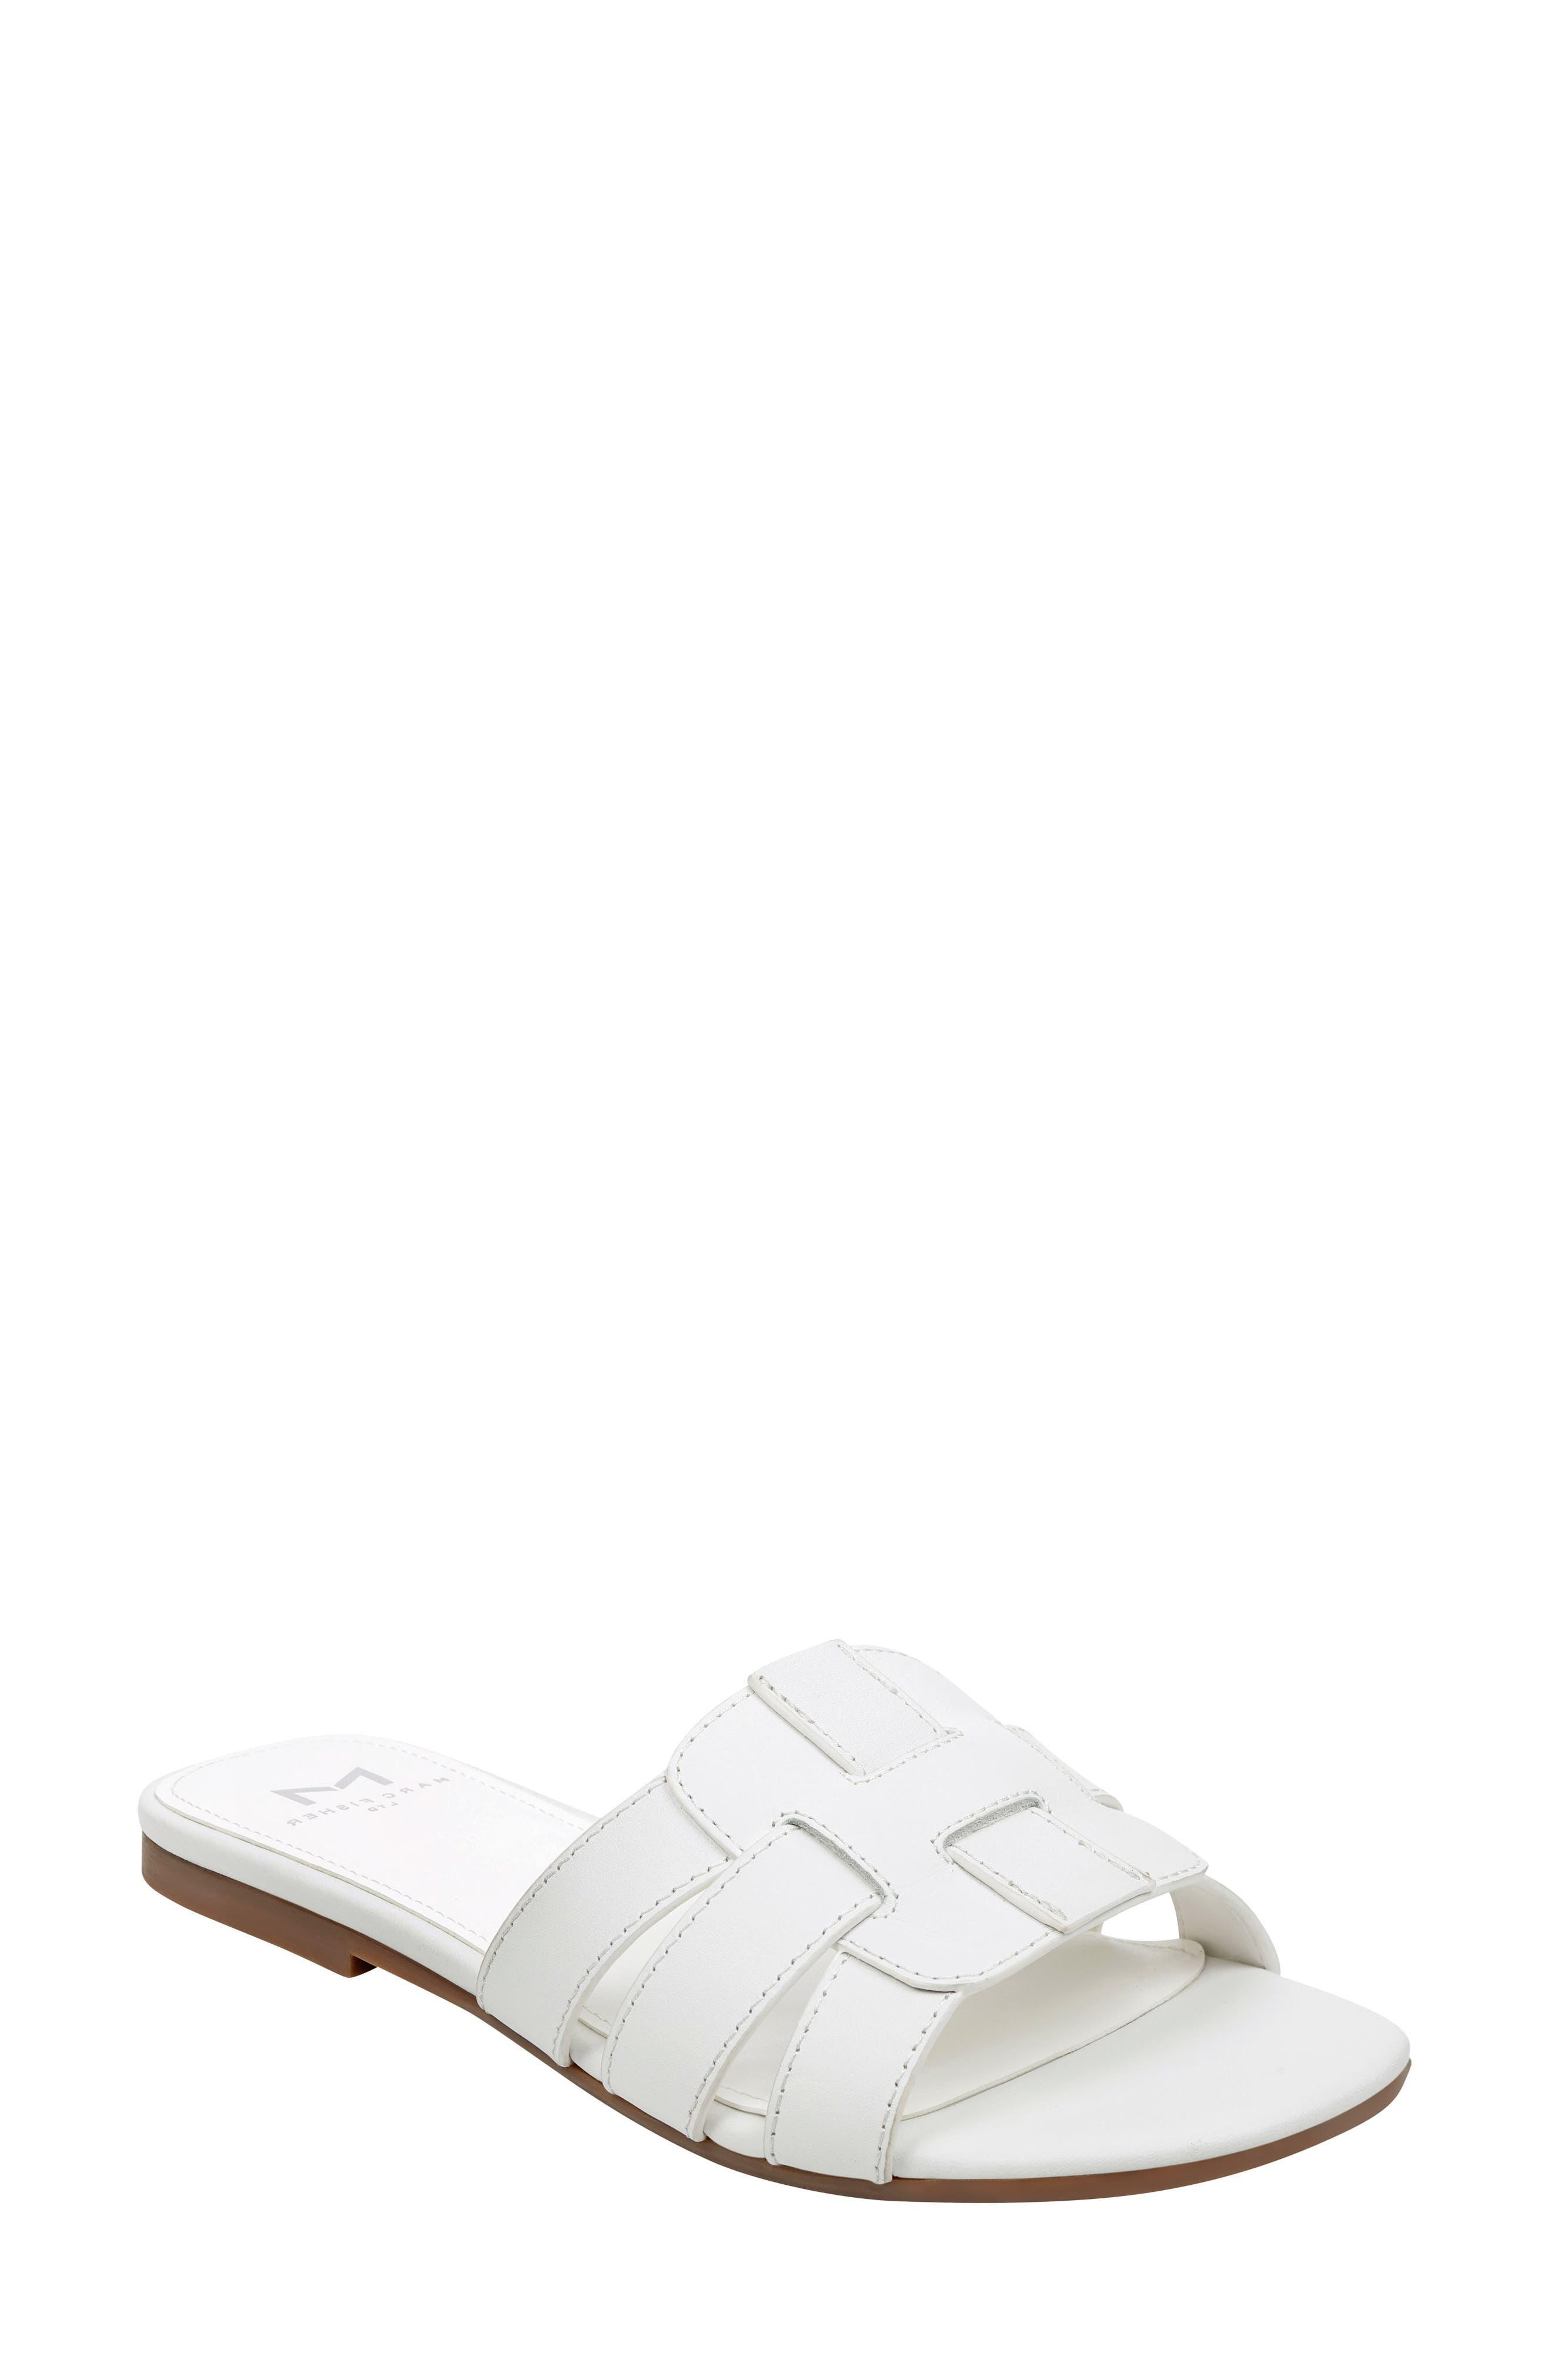 Marc Fisher Ltd Kayli Slide Sandal, White